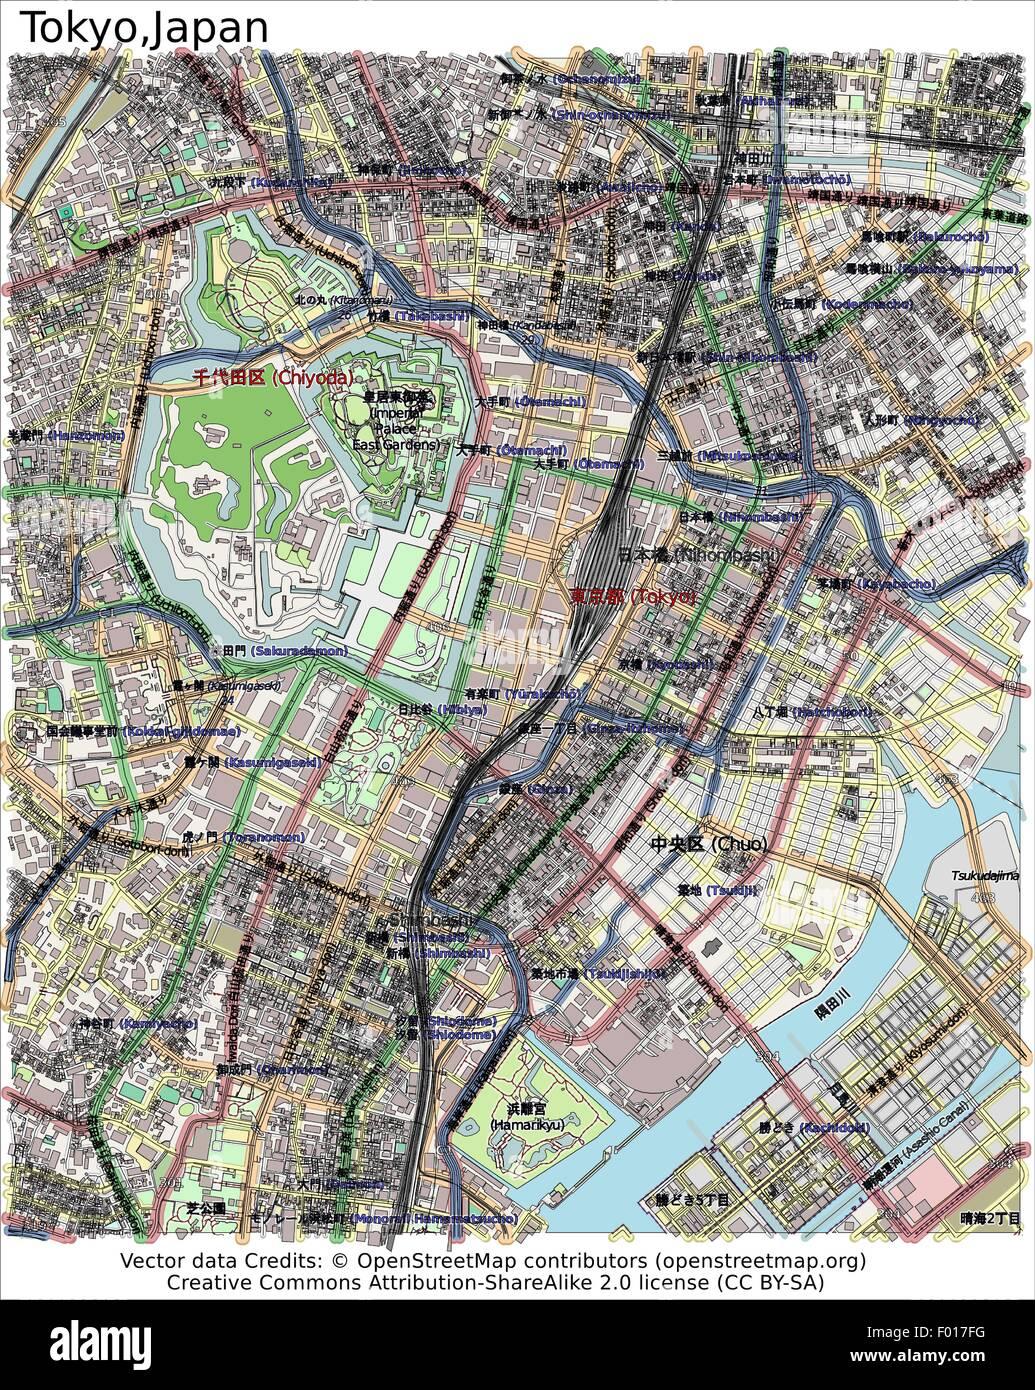 Aerial Map Of Japan.Tokyo Japan City Map Aerial View Stock Vector Art Illustration